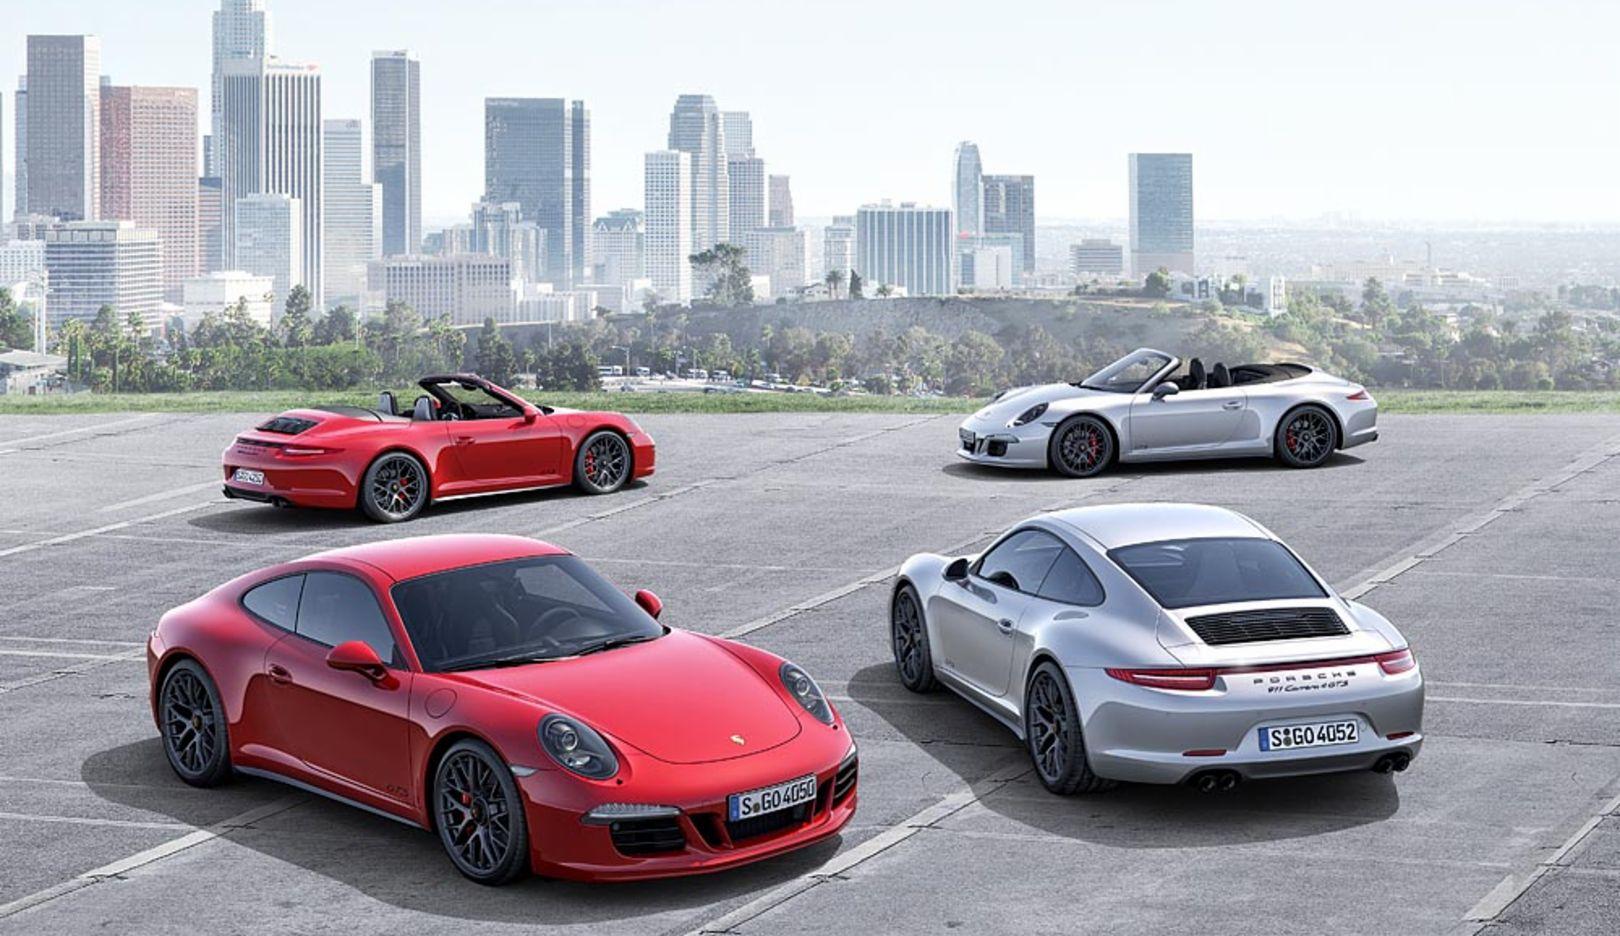 911 Carrera GTS Coupé, 911 Carrera GTS Cabriolet, 2014, Porsche AG